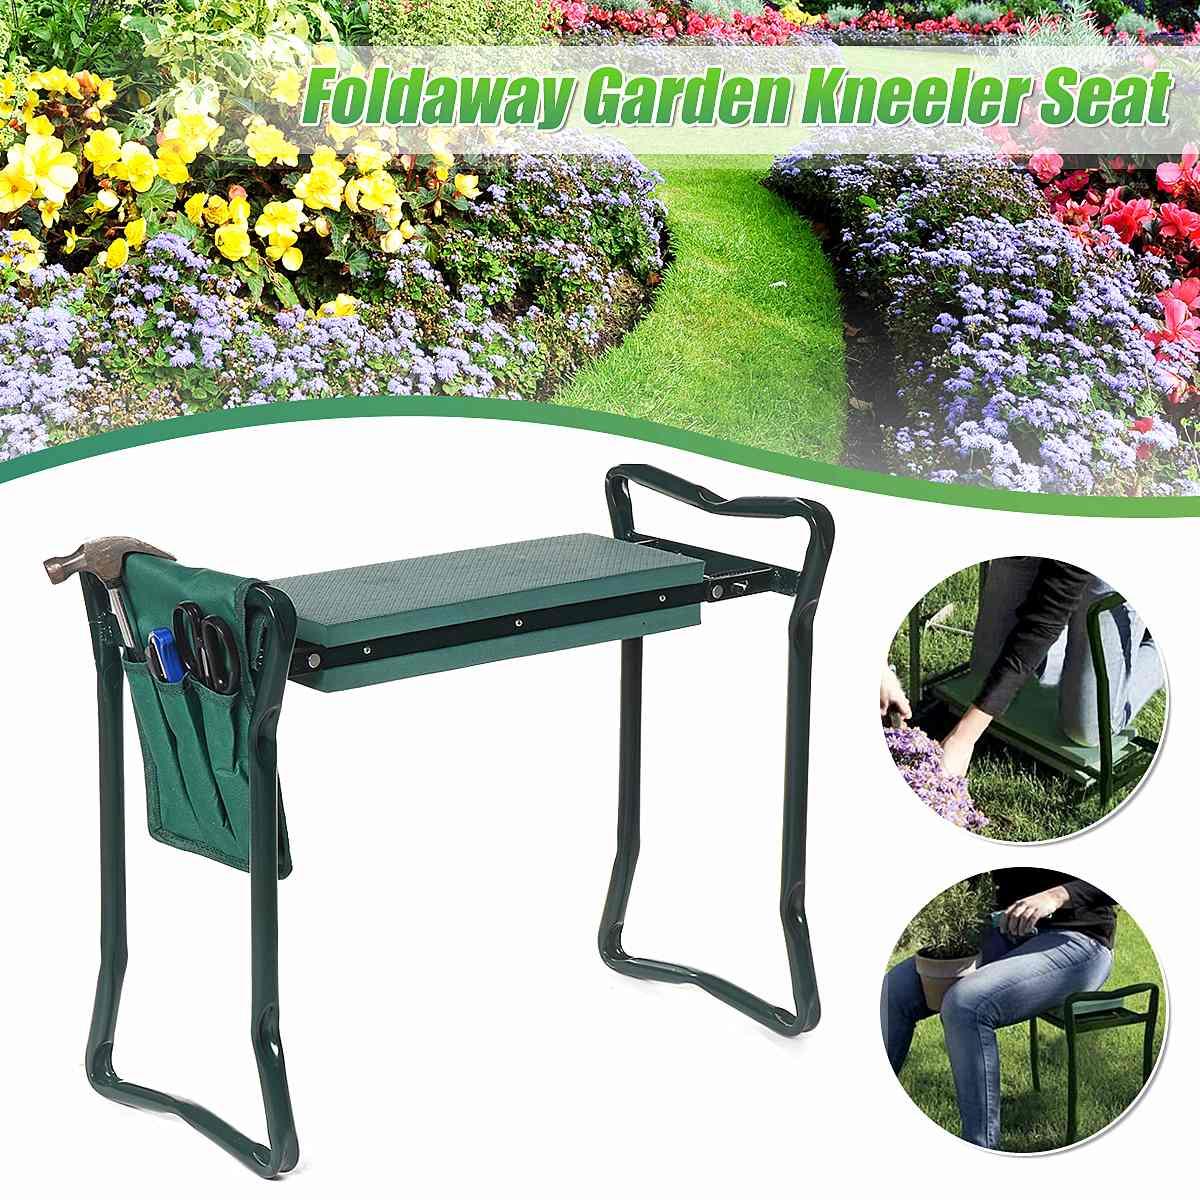 1Pcs Folding Garden Kneeler Tool Bag Pouch Tool Storage Bag Portable Garden Stool With EVA Foam Mat Multifunctional Chair Seat